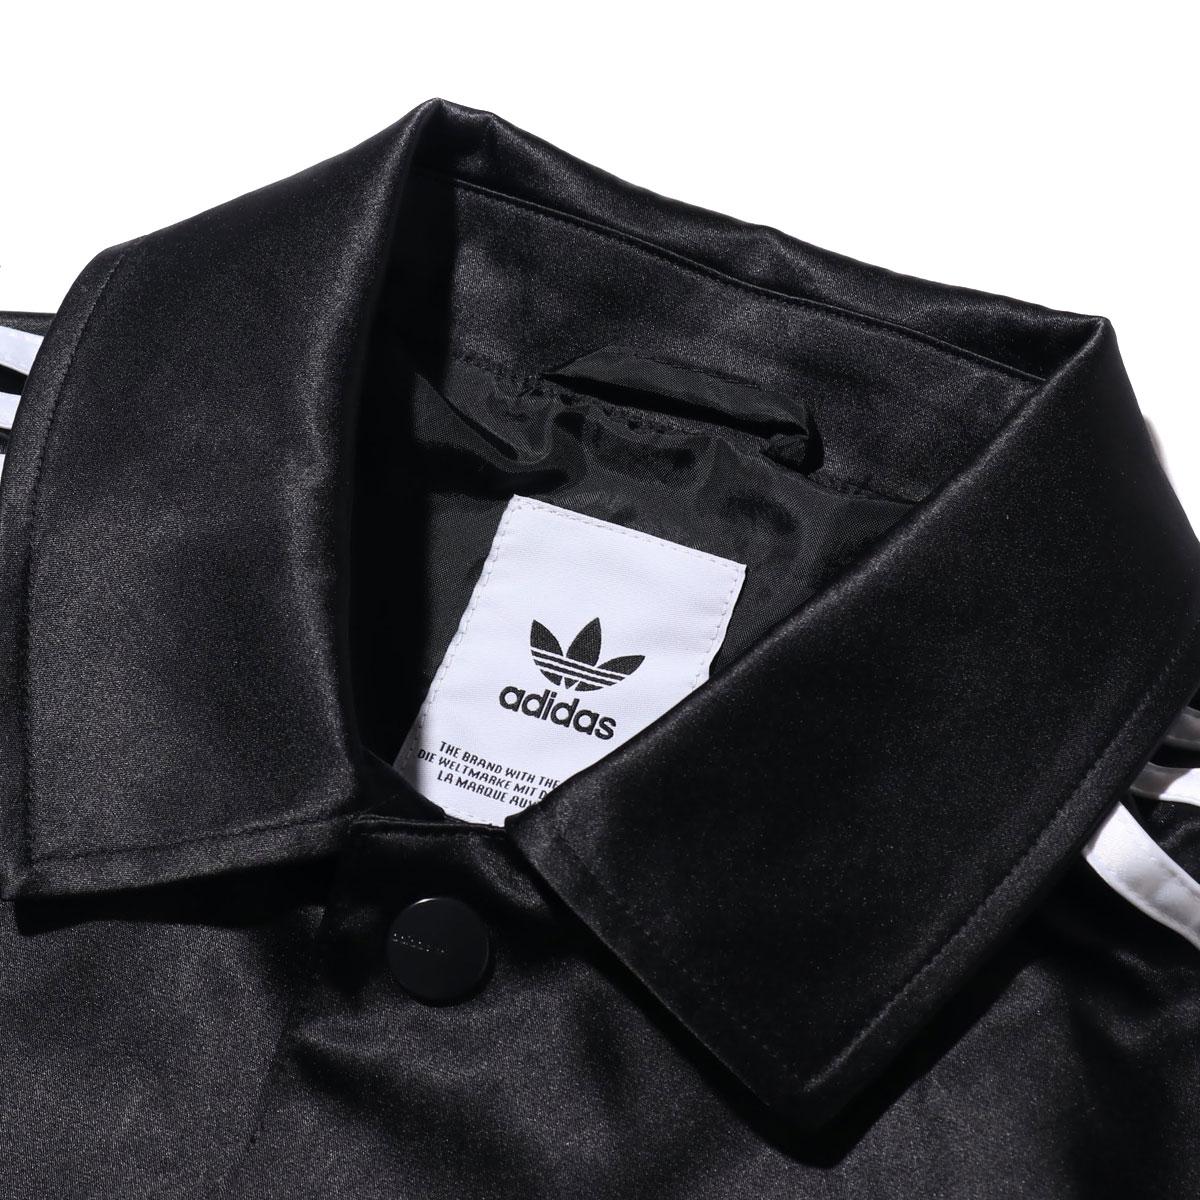 adidas SATIN COACH JACKET アディダス サテン コーチ ジャケット BLACK メンズ ジャケット 19FW SsxrhCBtQd